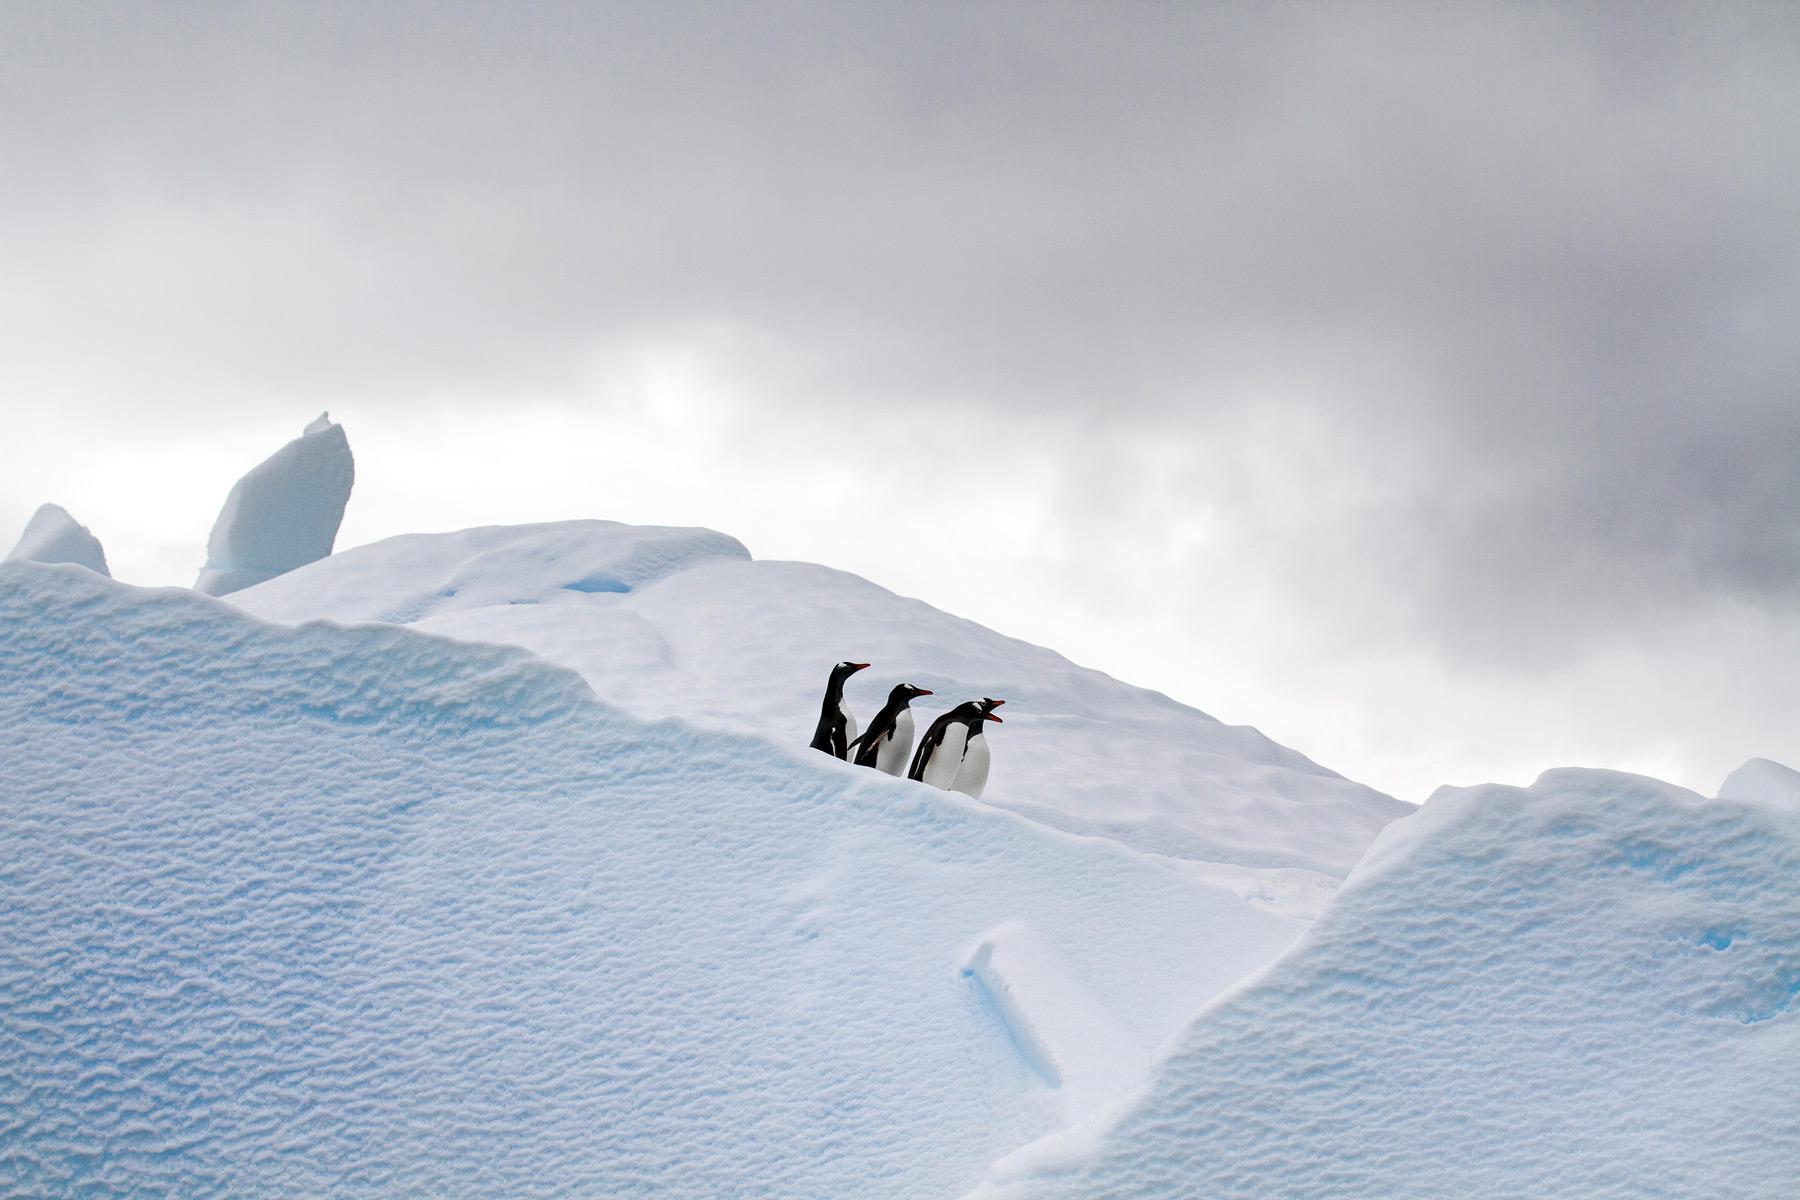 Gentoo penguins on an iceberg in Wilhemina Bay, Antarctica